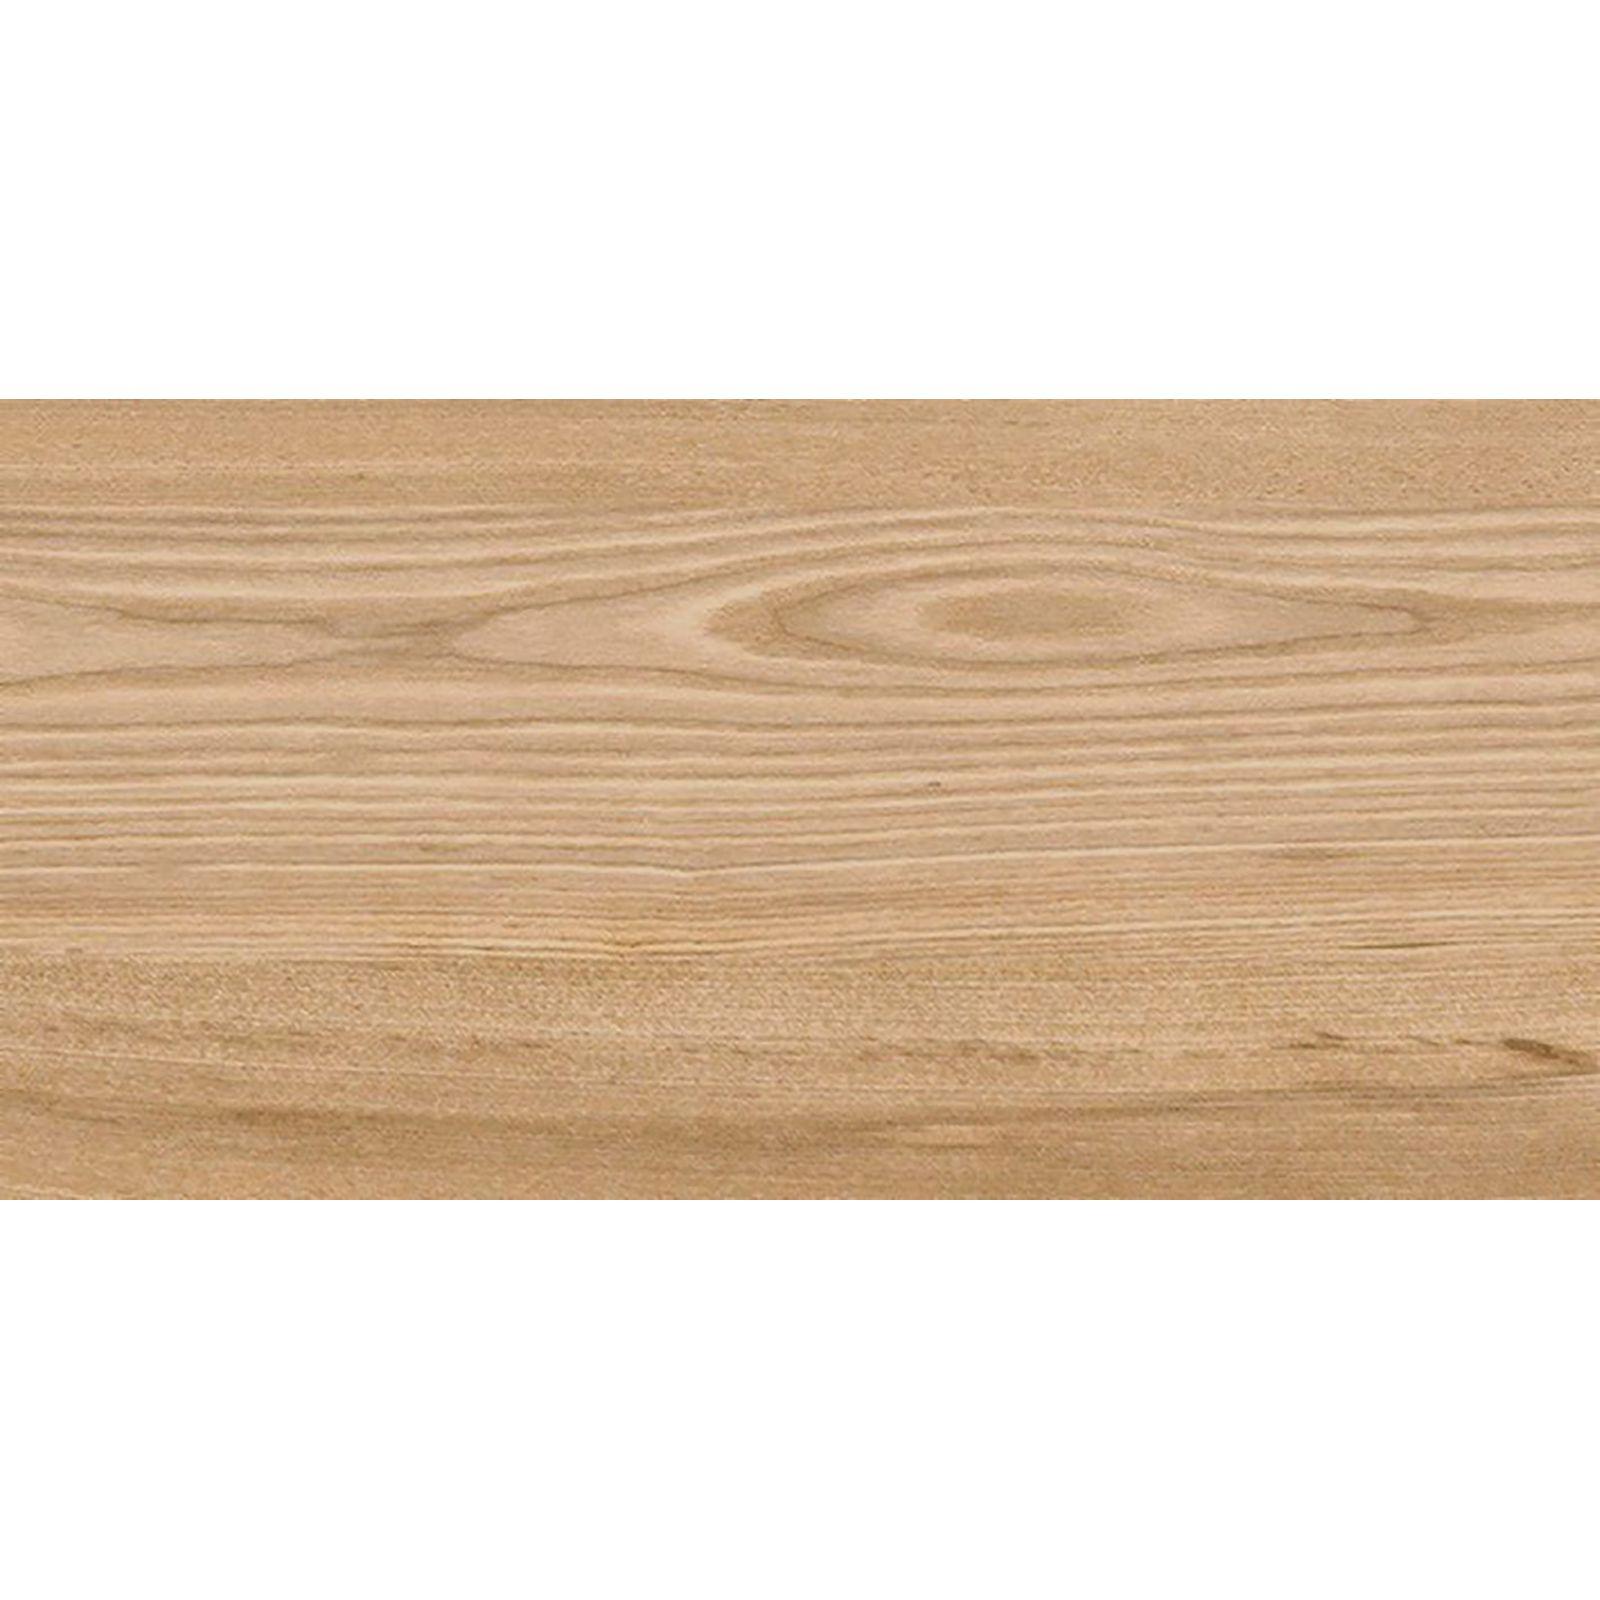 Bunnings - Johnson Tiles 10 x 10mm Natural Wood Flamed Teak